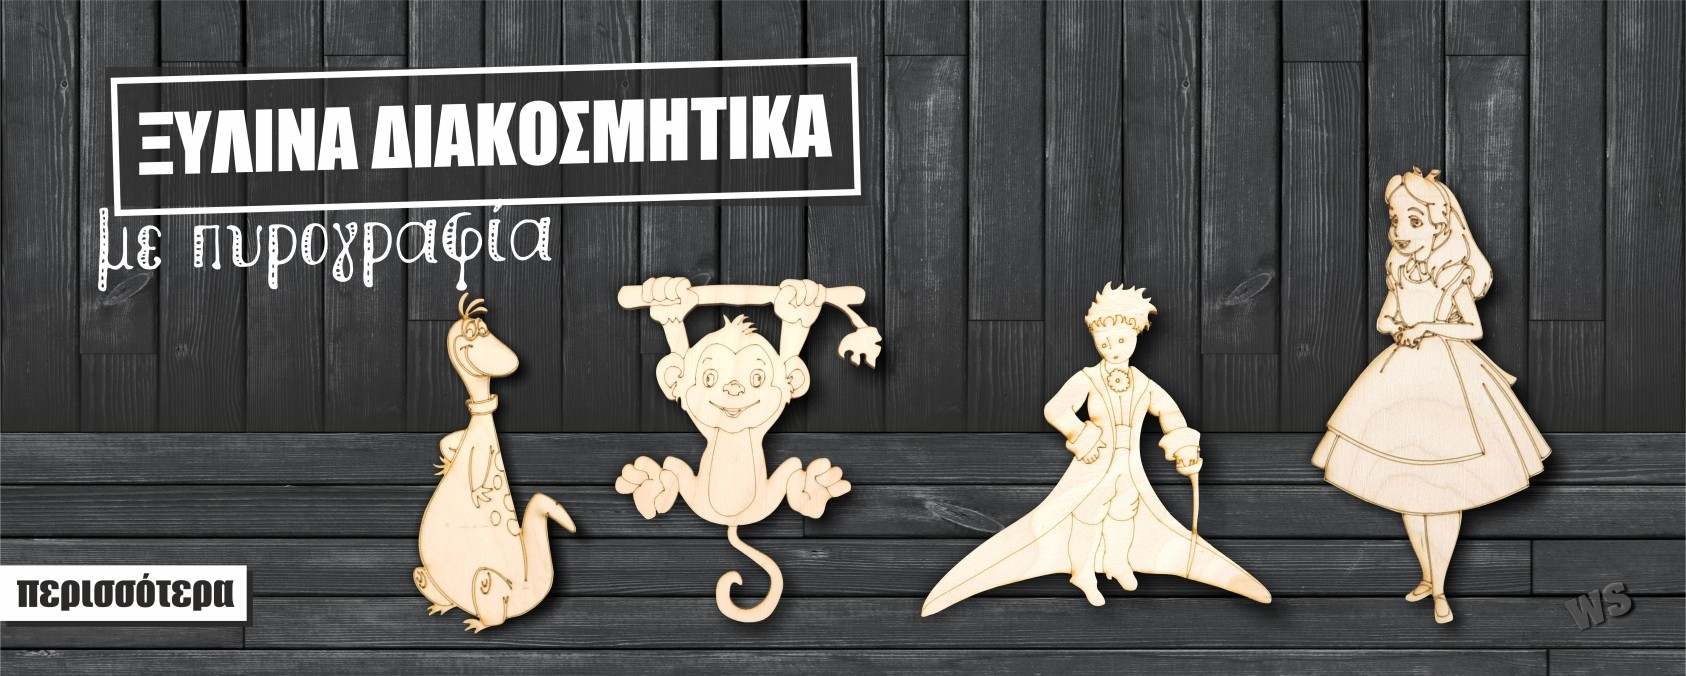 ksulina_diakosmhtika_purografia